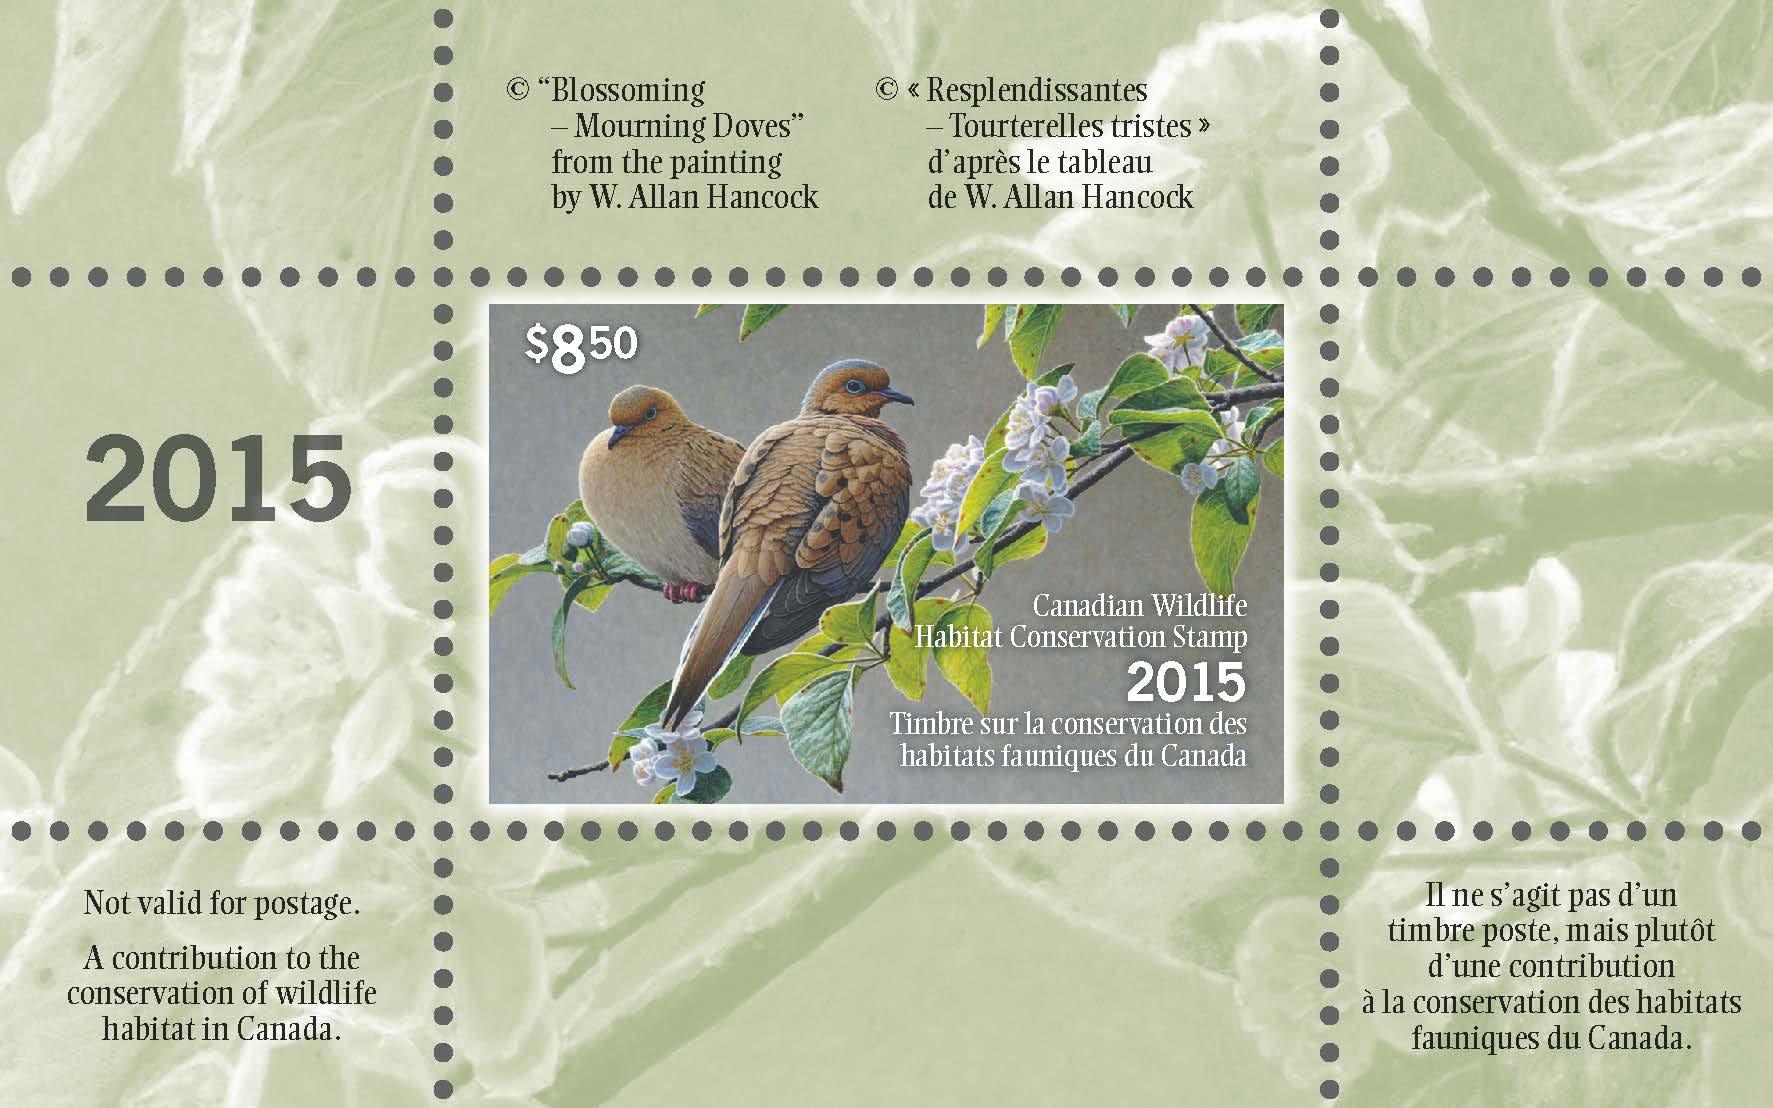 2015 Wildlife Habitat Conservation Stamp by W. Allan Hancock